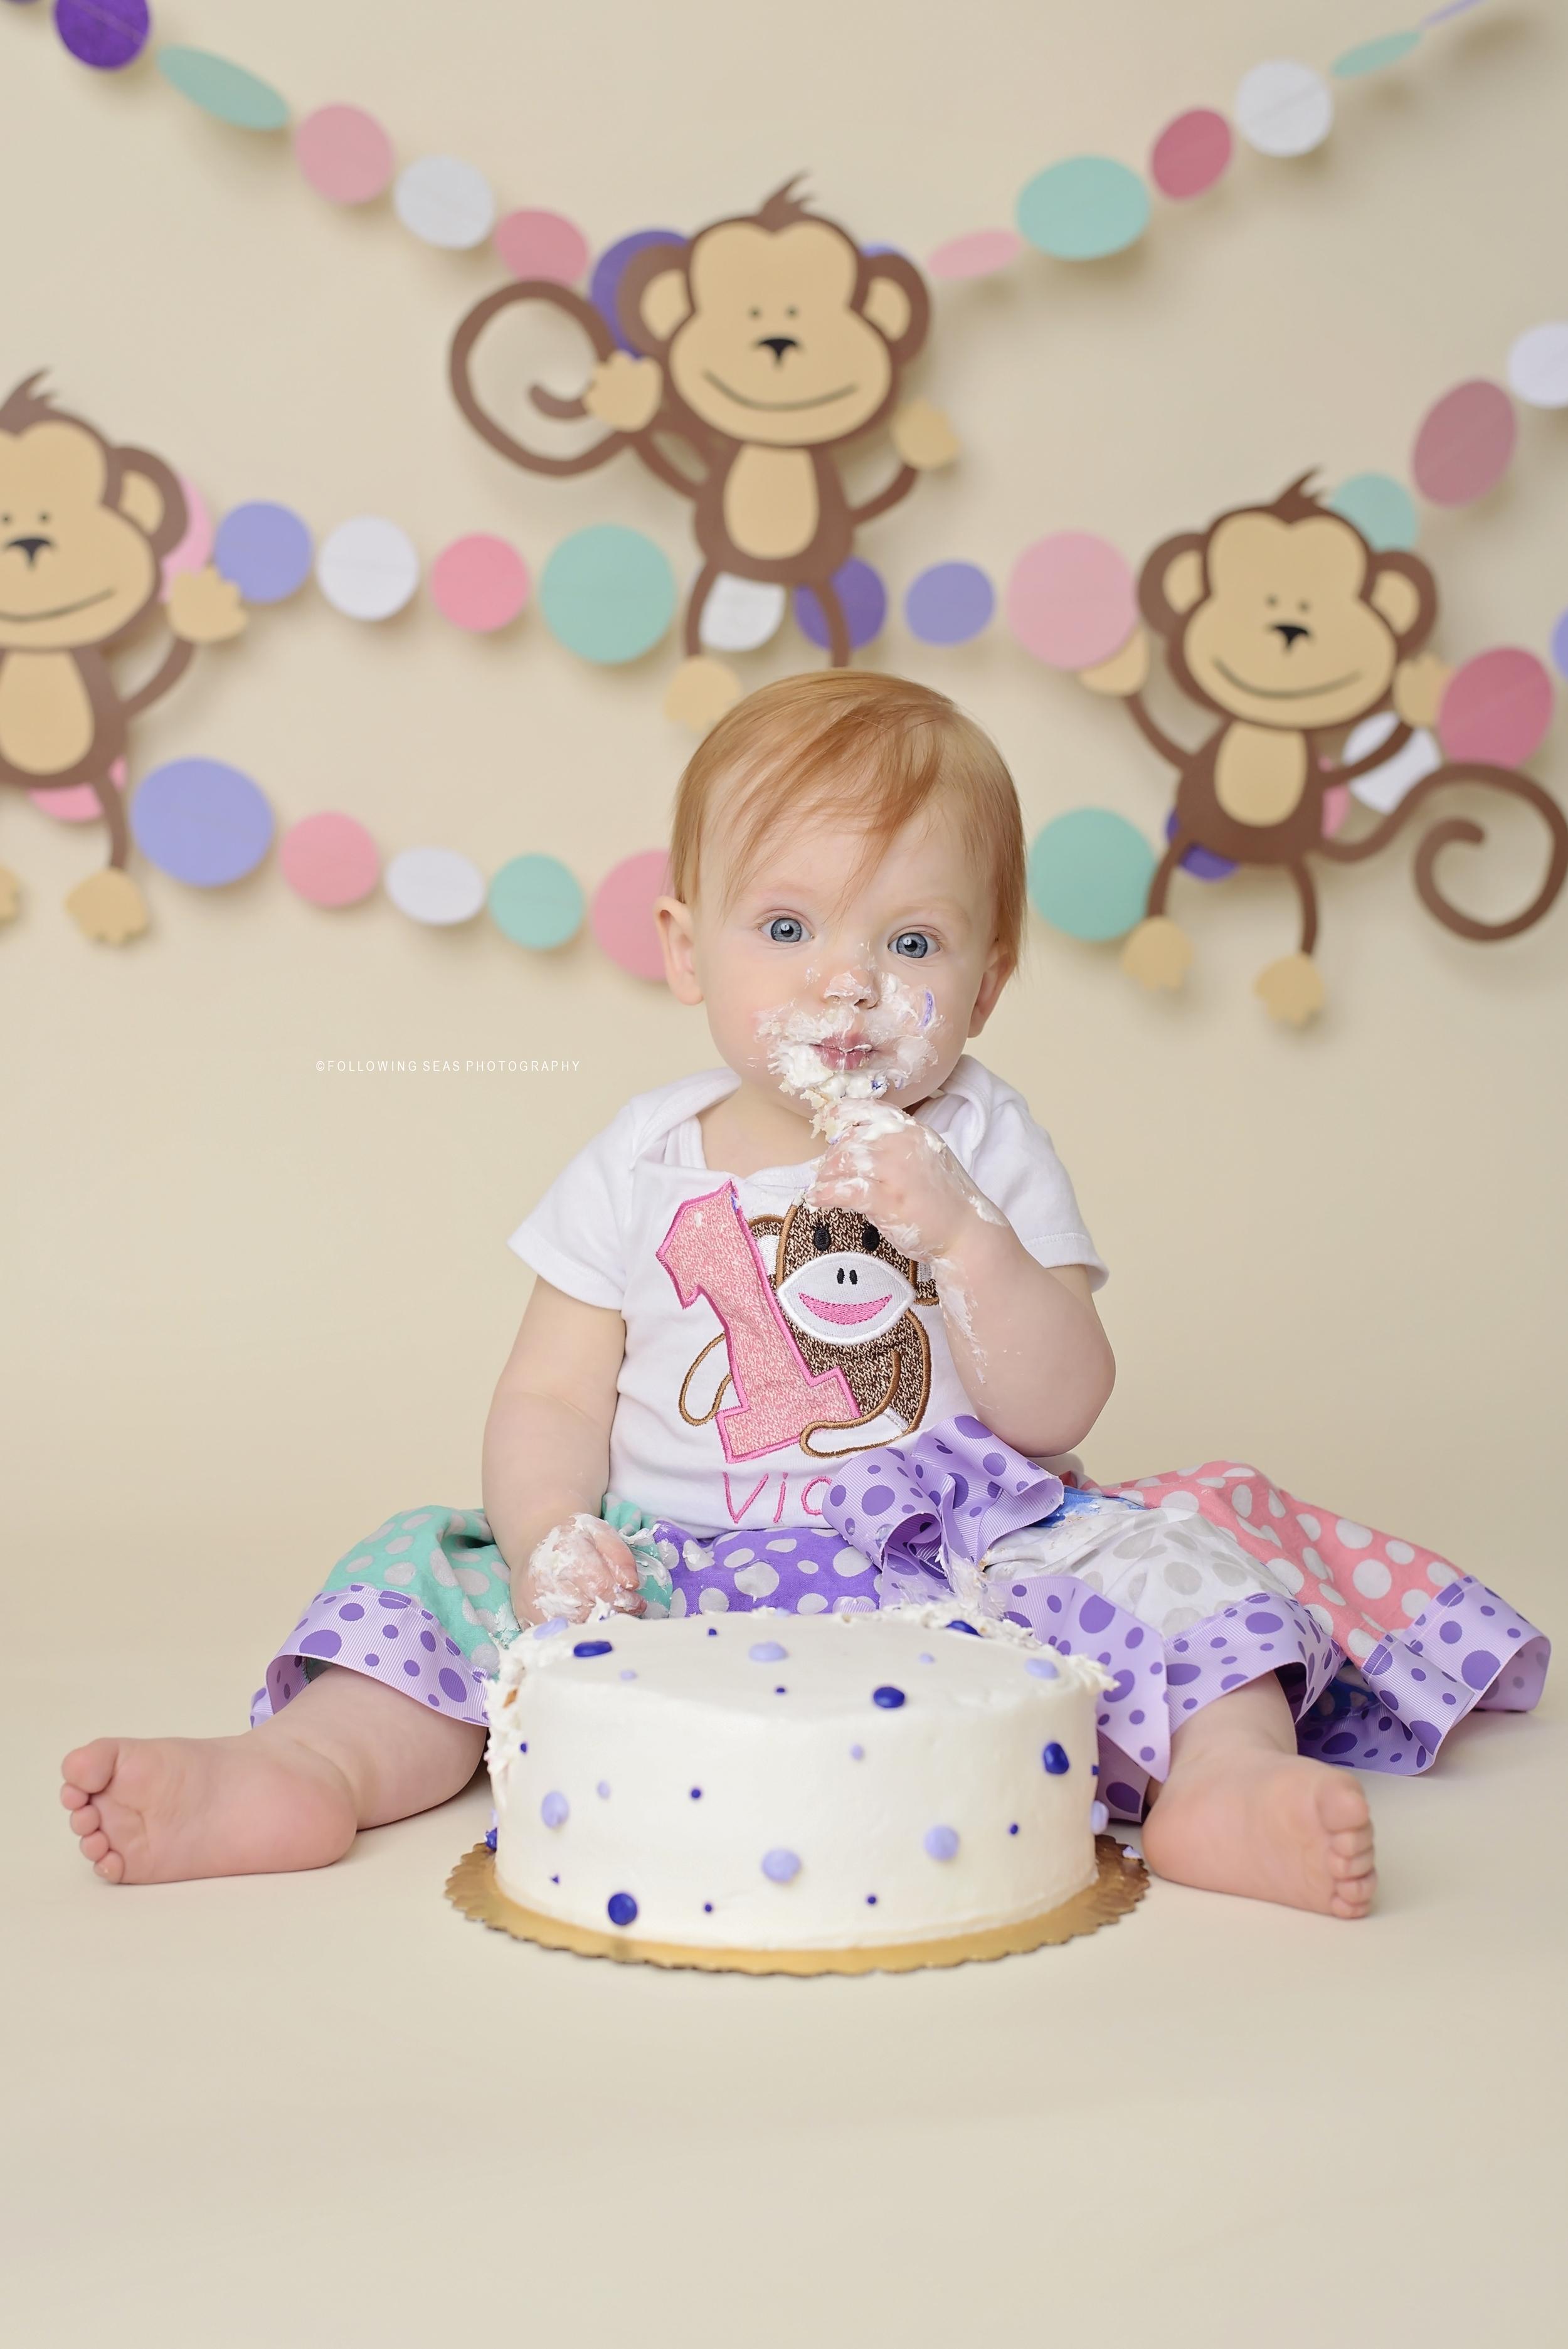 Bremerton Cake Smash Photographer-5103 copy.jpg